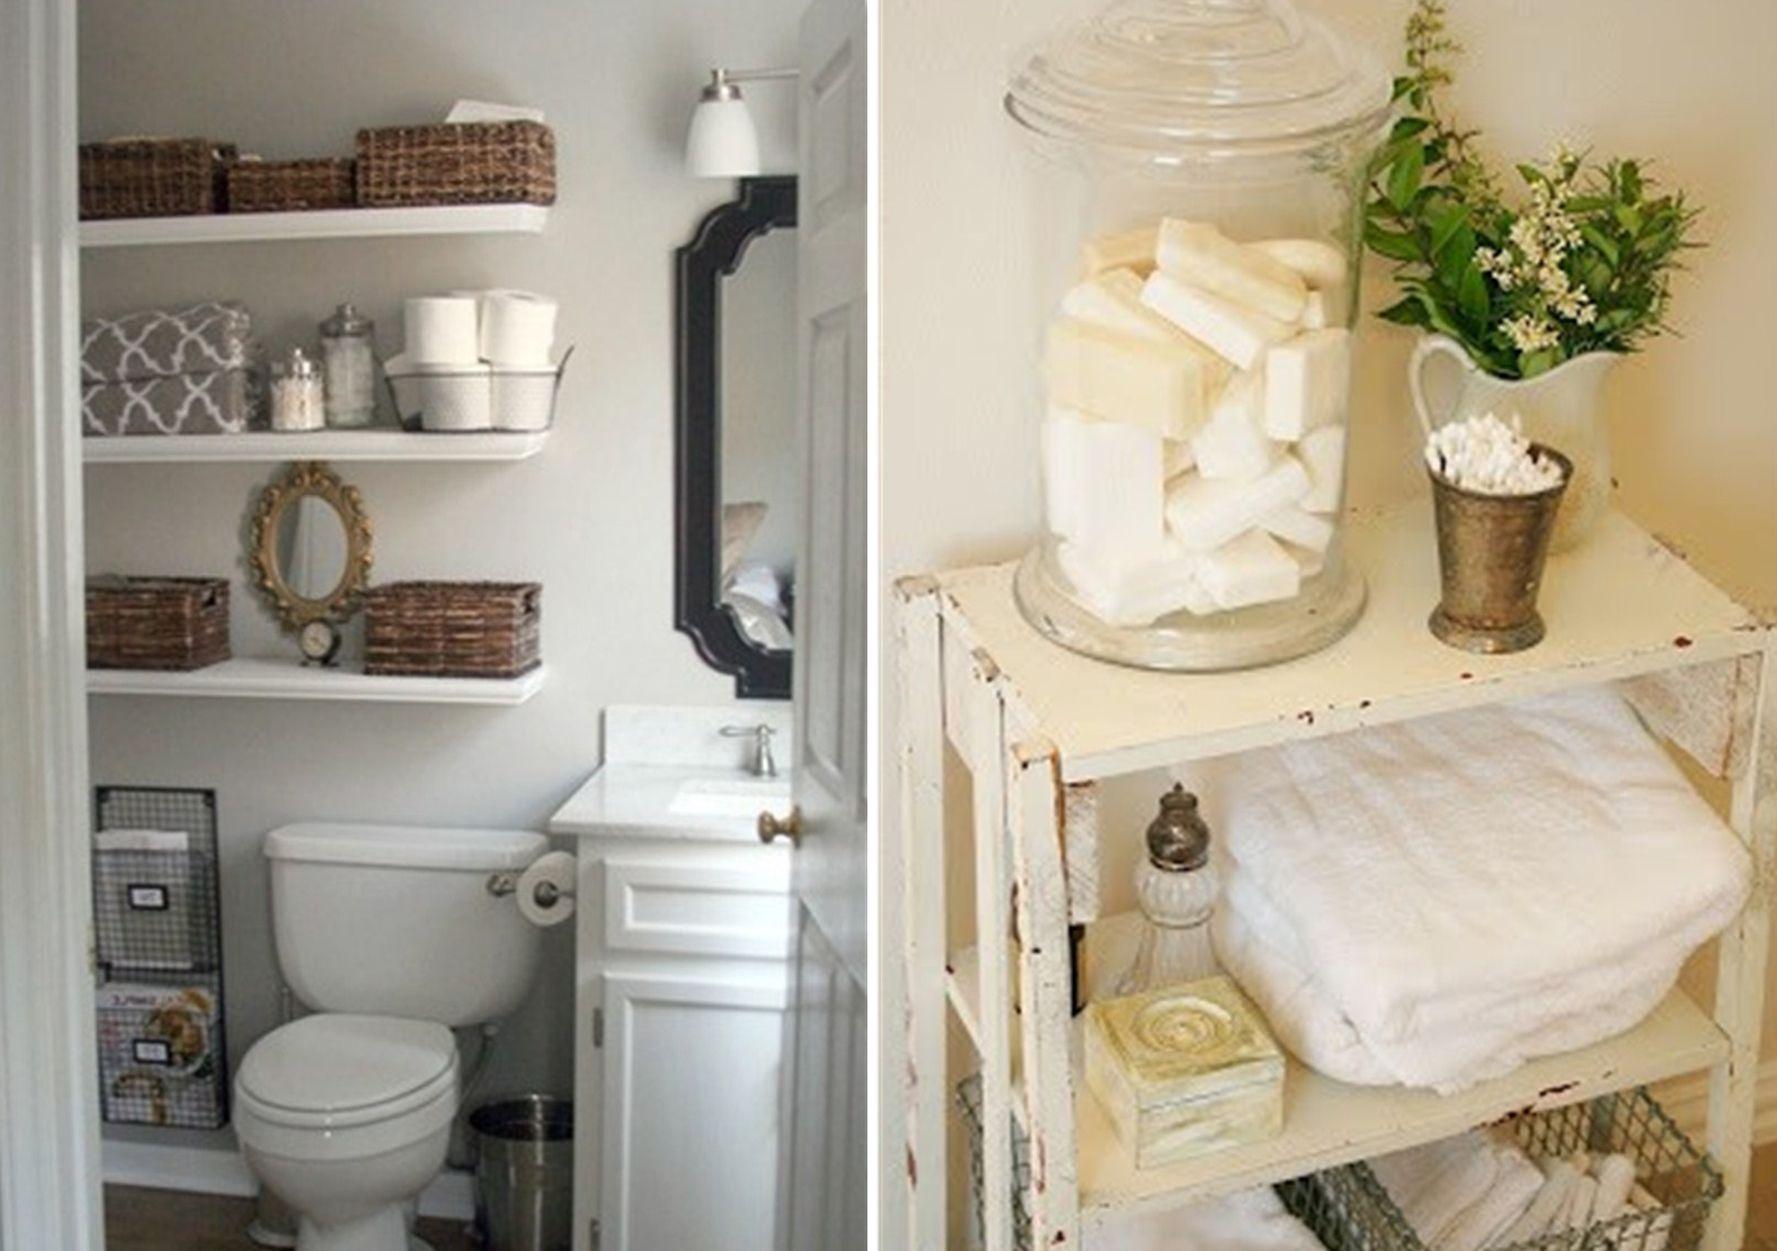 Toilet Room Bath Towel Storage Ideas Buds Parfume Lotion Towel Storage Towel Basket White White Bathroom Storage Small Bathroom Cabinets Small Space Bathroom